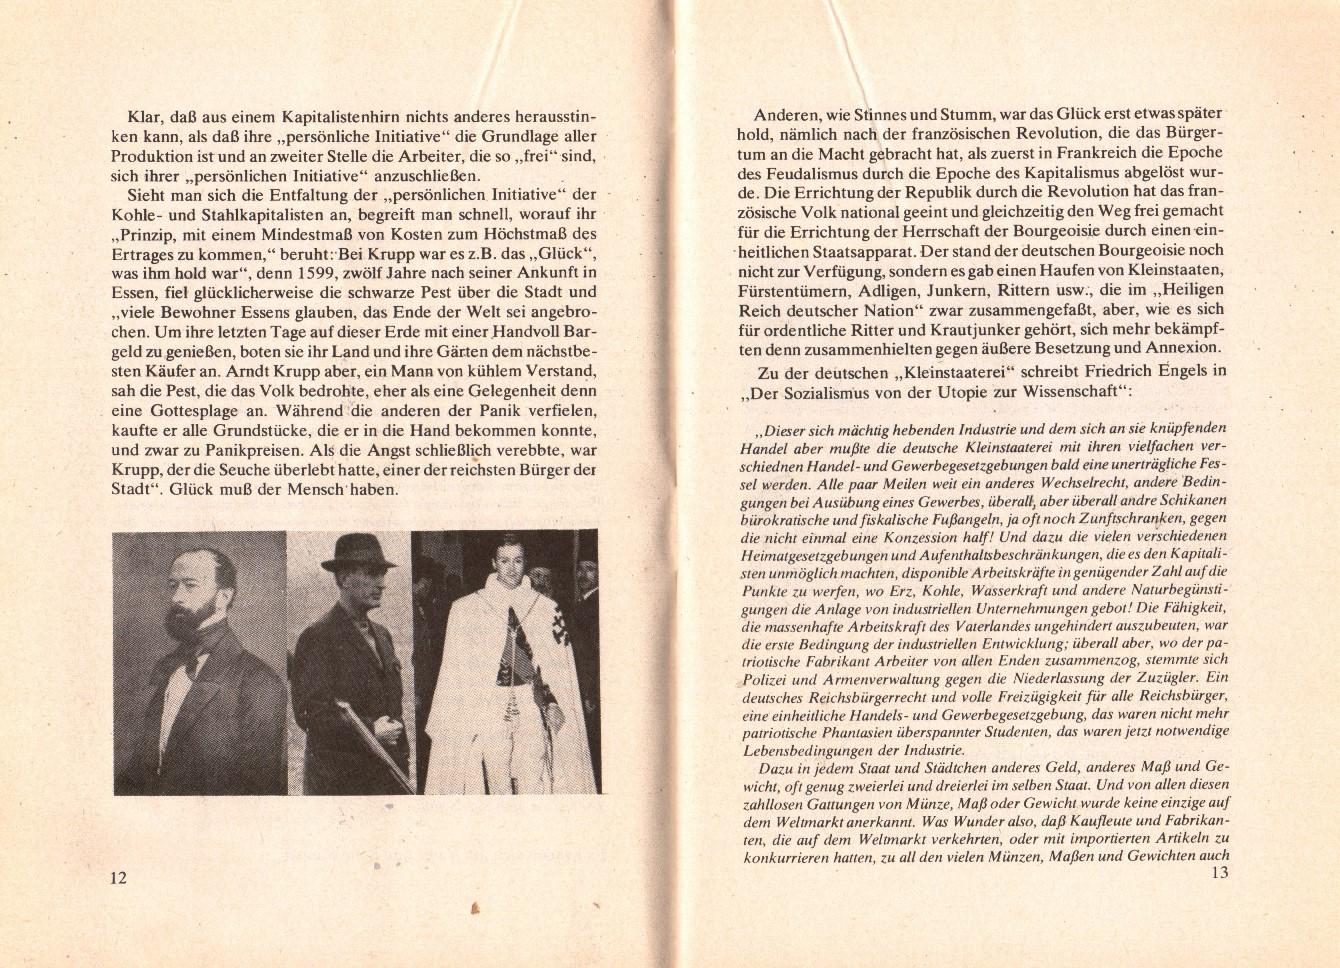 NRW_KBW_1977_Politik_der_Kohle_u_Stahlbarone_07